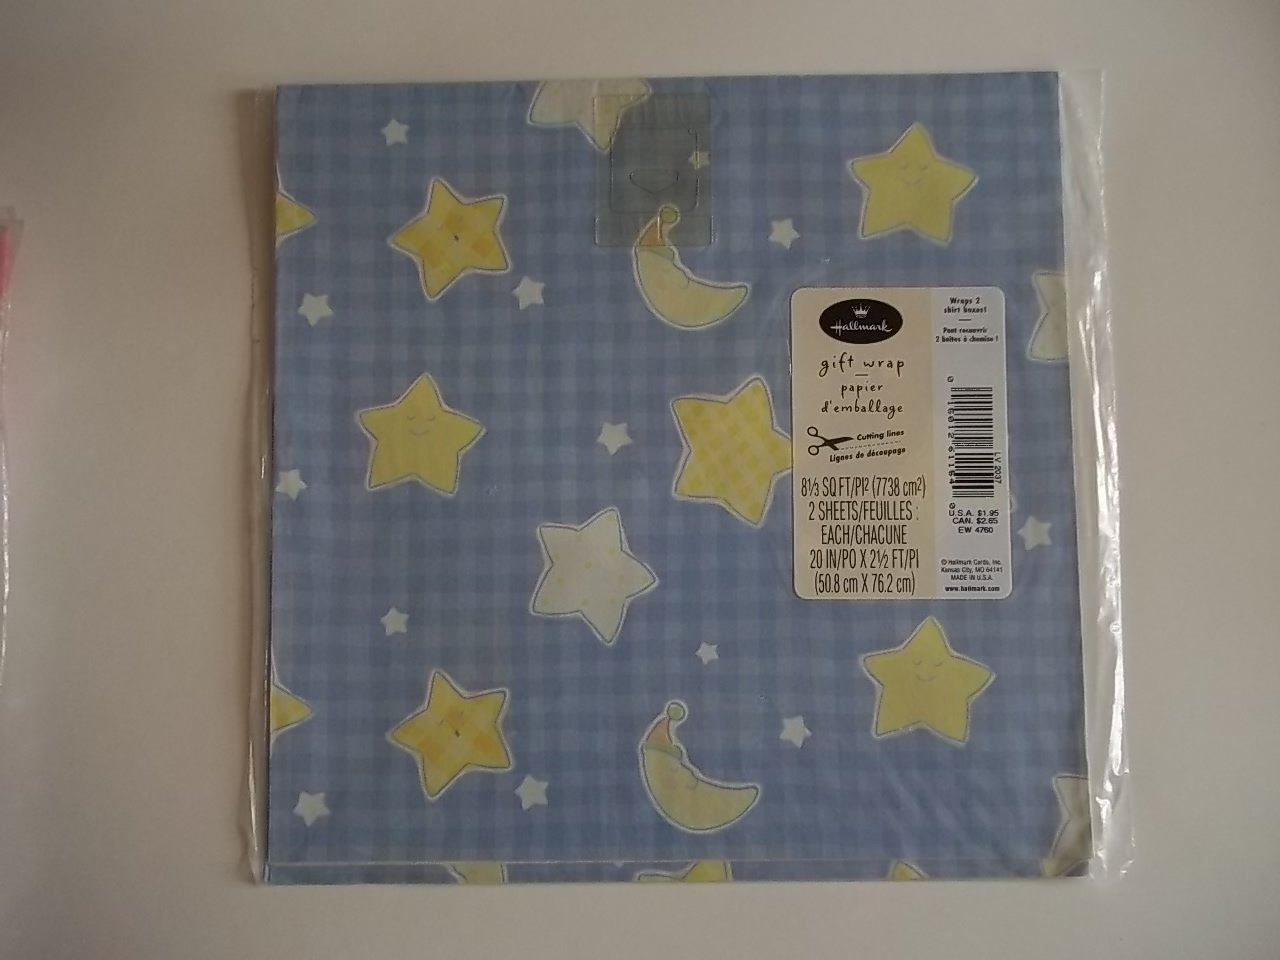 MOON & STARS HALLMARK GIFT WRAP 2 SHEETS WRAPPING PAPER FREE SHIPPING ~ Ceramic Treasures